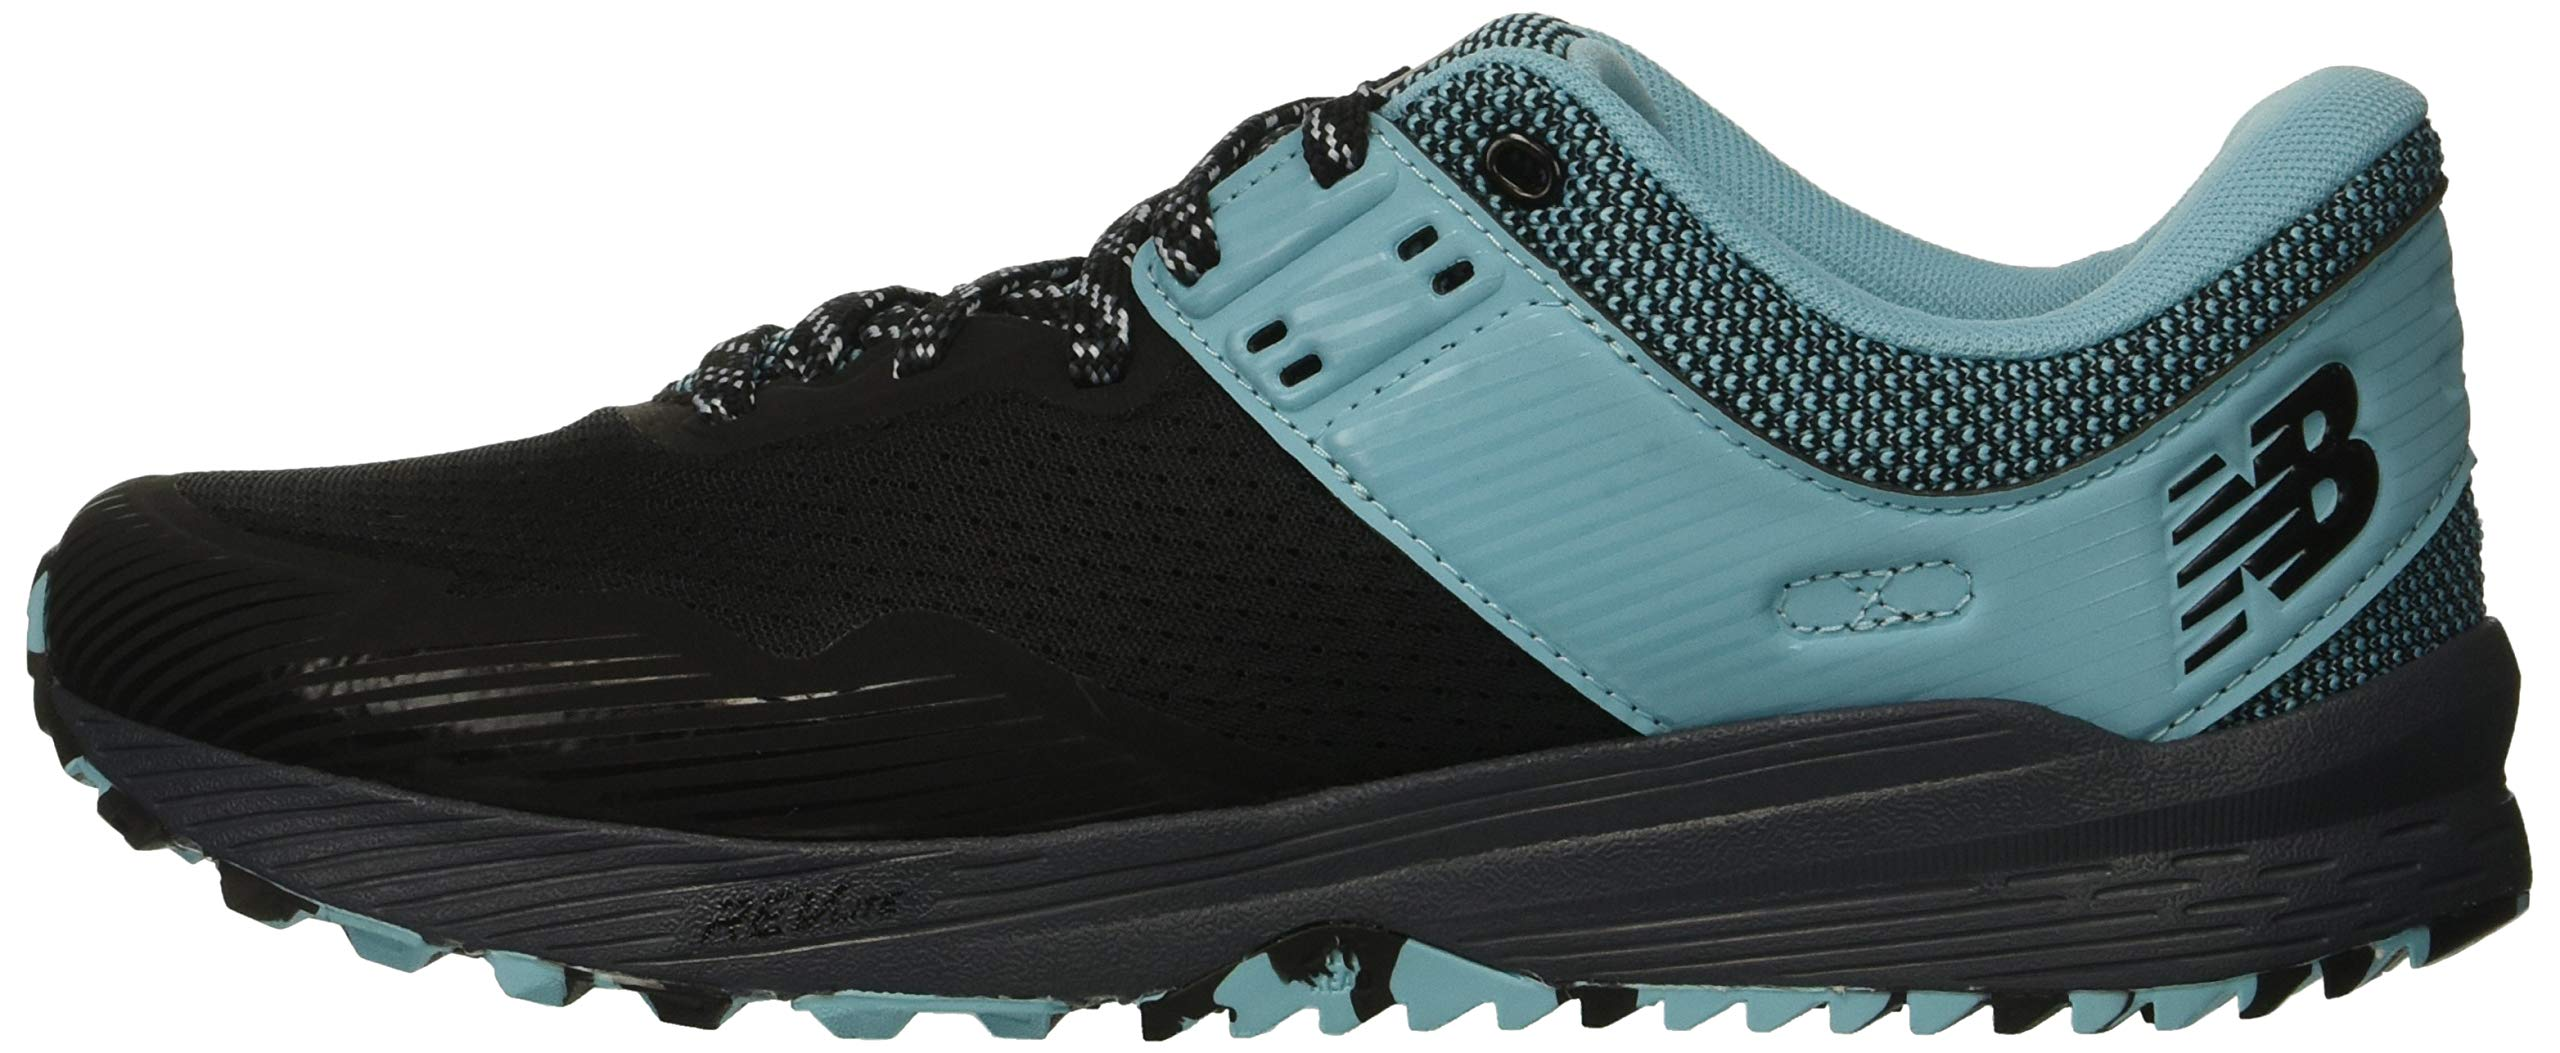 New Balance Women's Nitrel V2 FuelCore Trail Running Shoe, Black/Thunder/Enamel Blue, 6 B US by New Balance (Image #5)